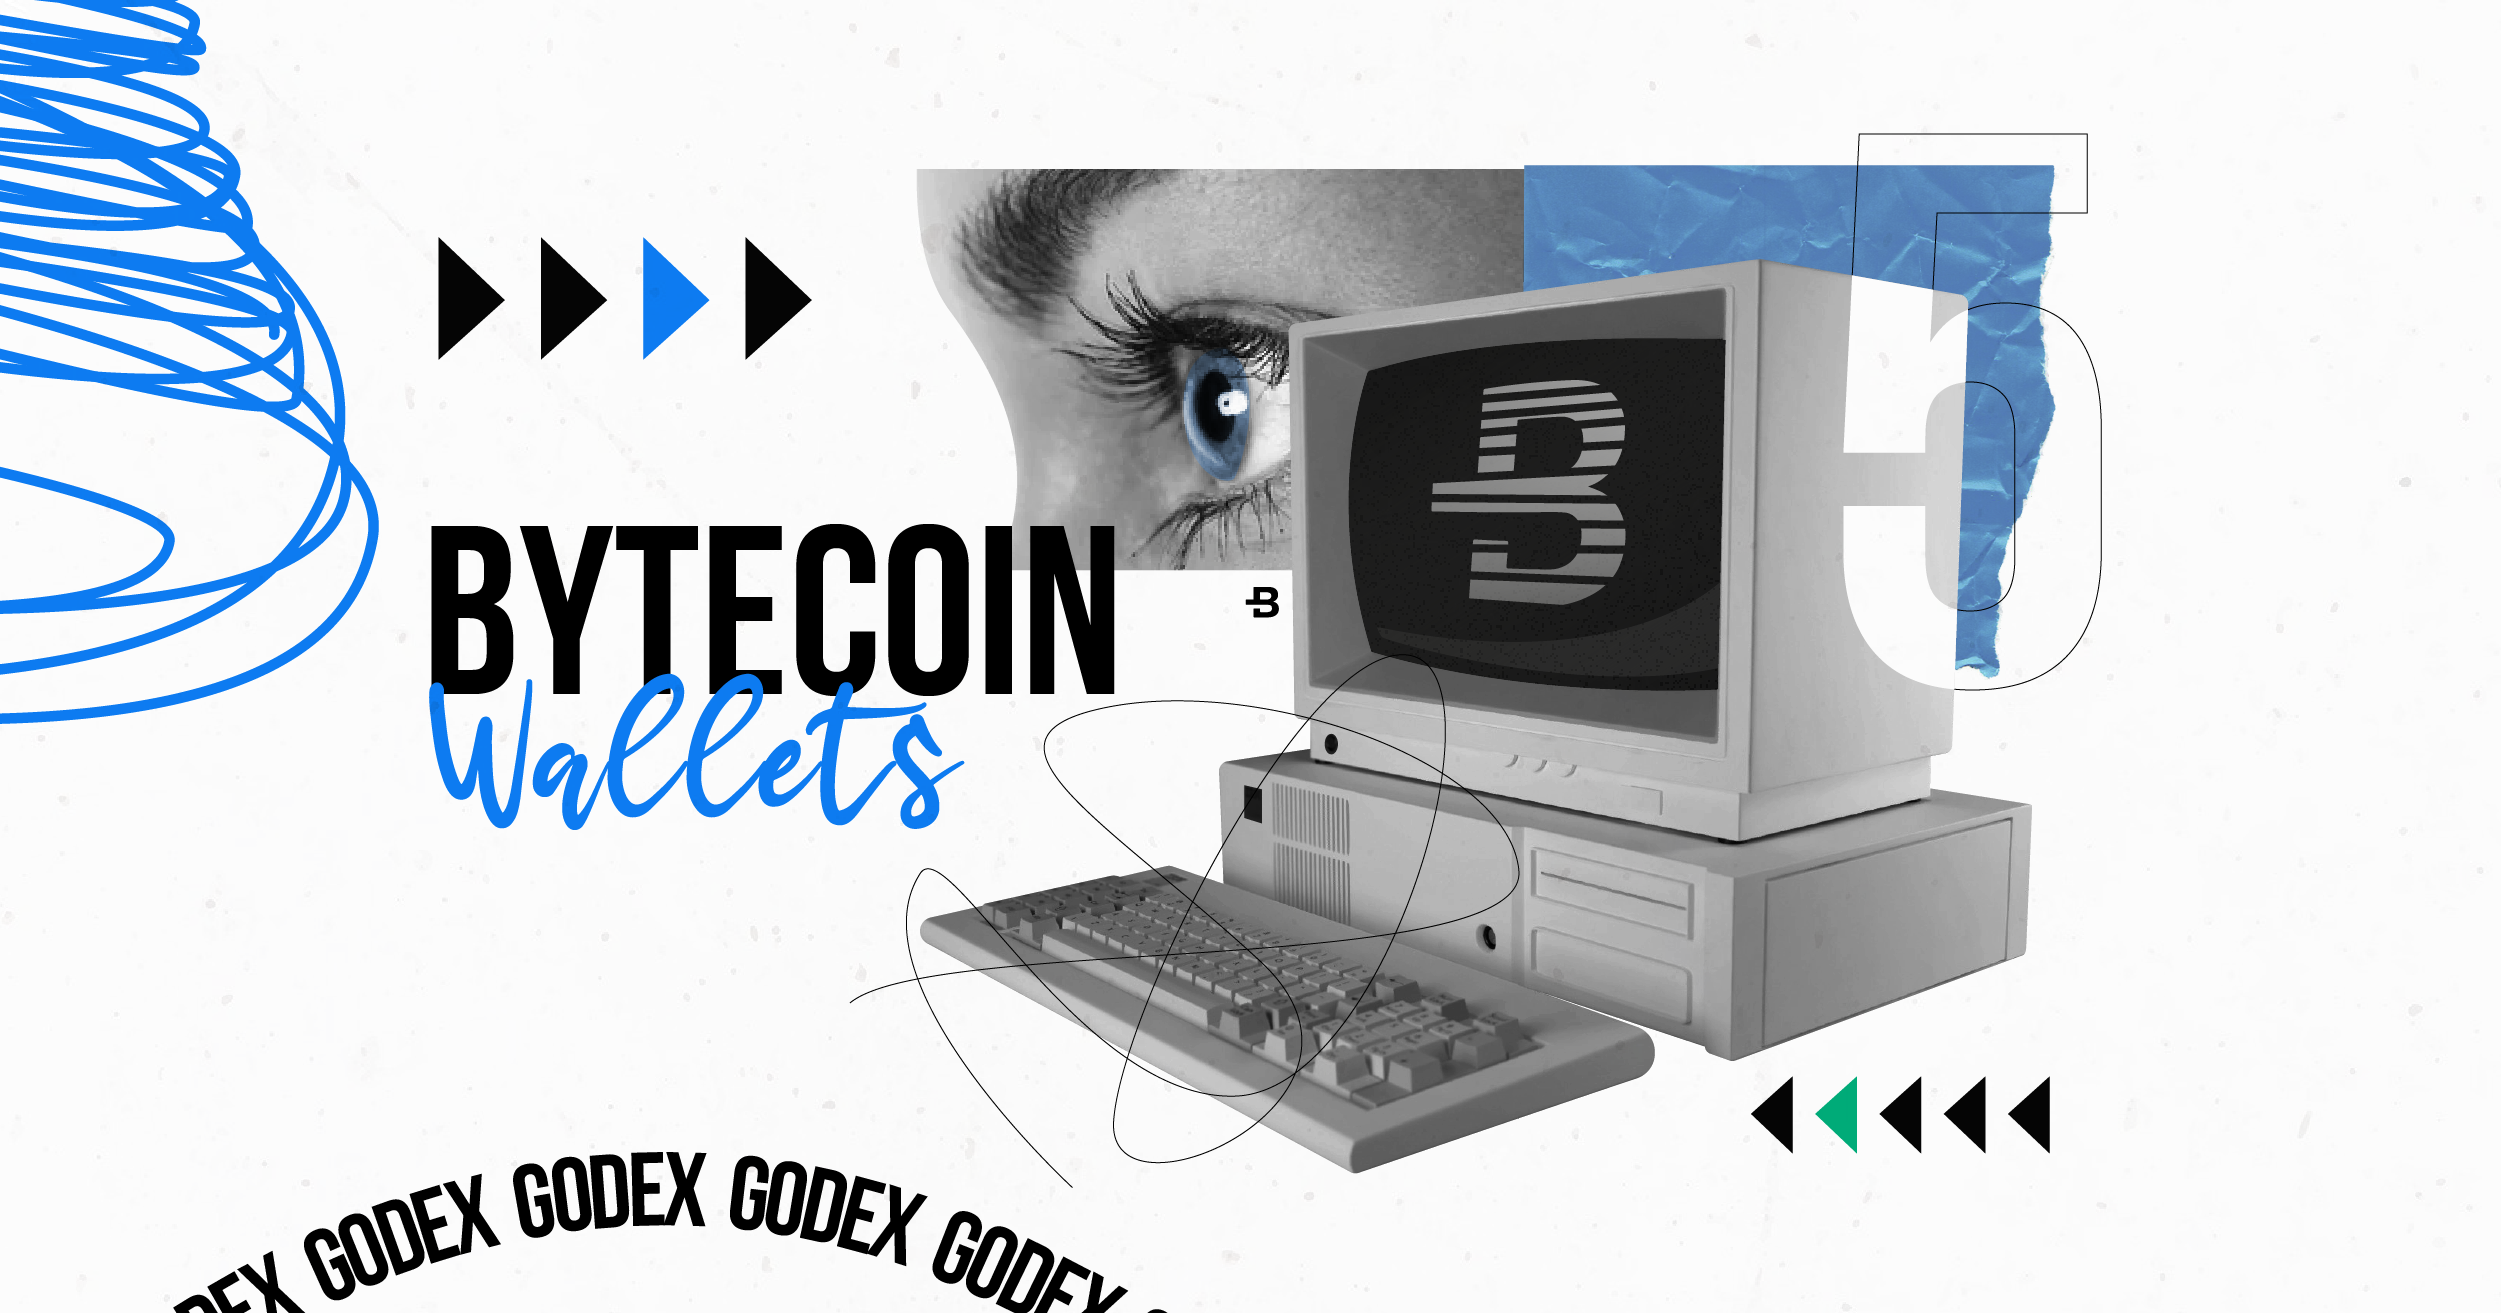 Bytecoin Wallets Top 5